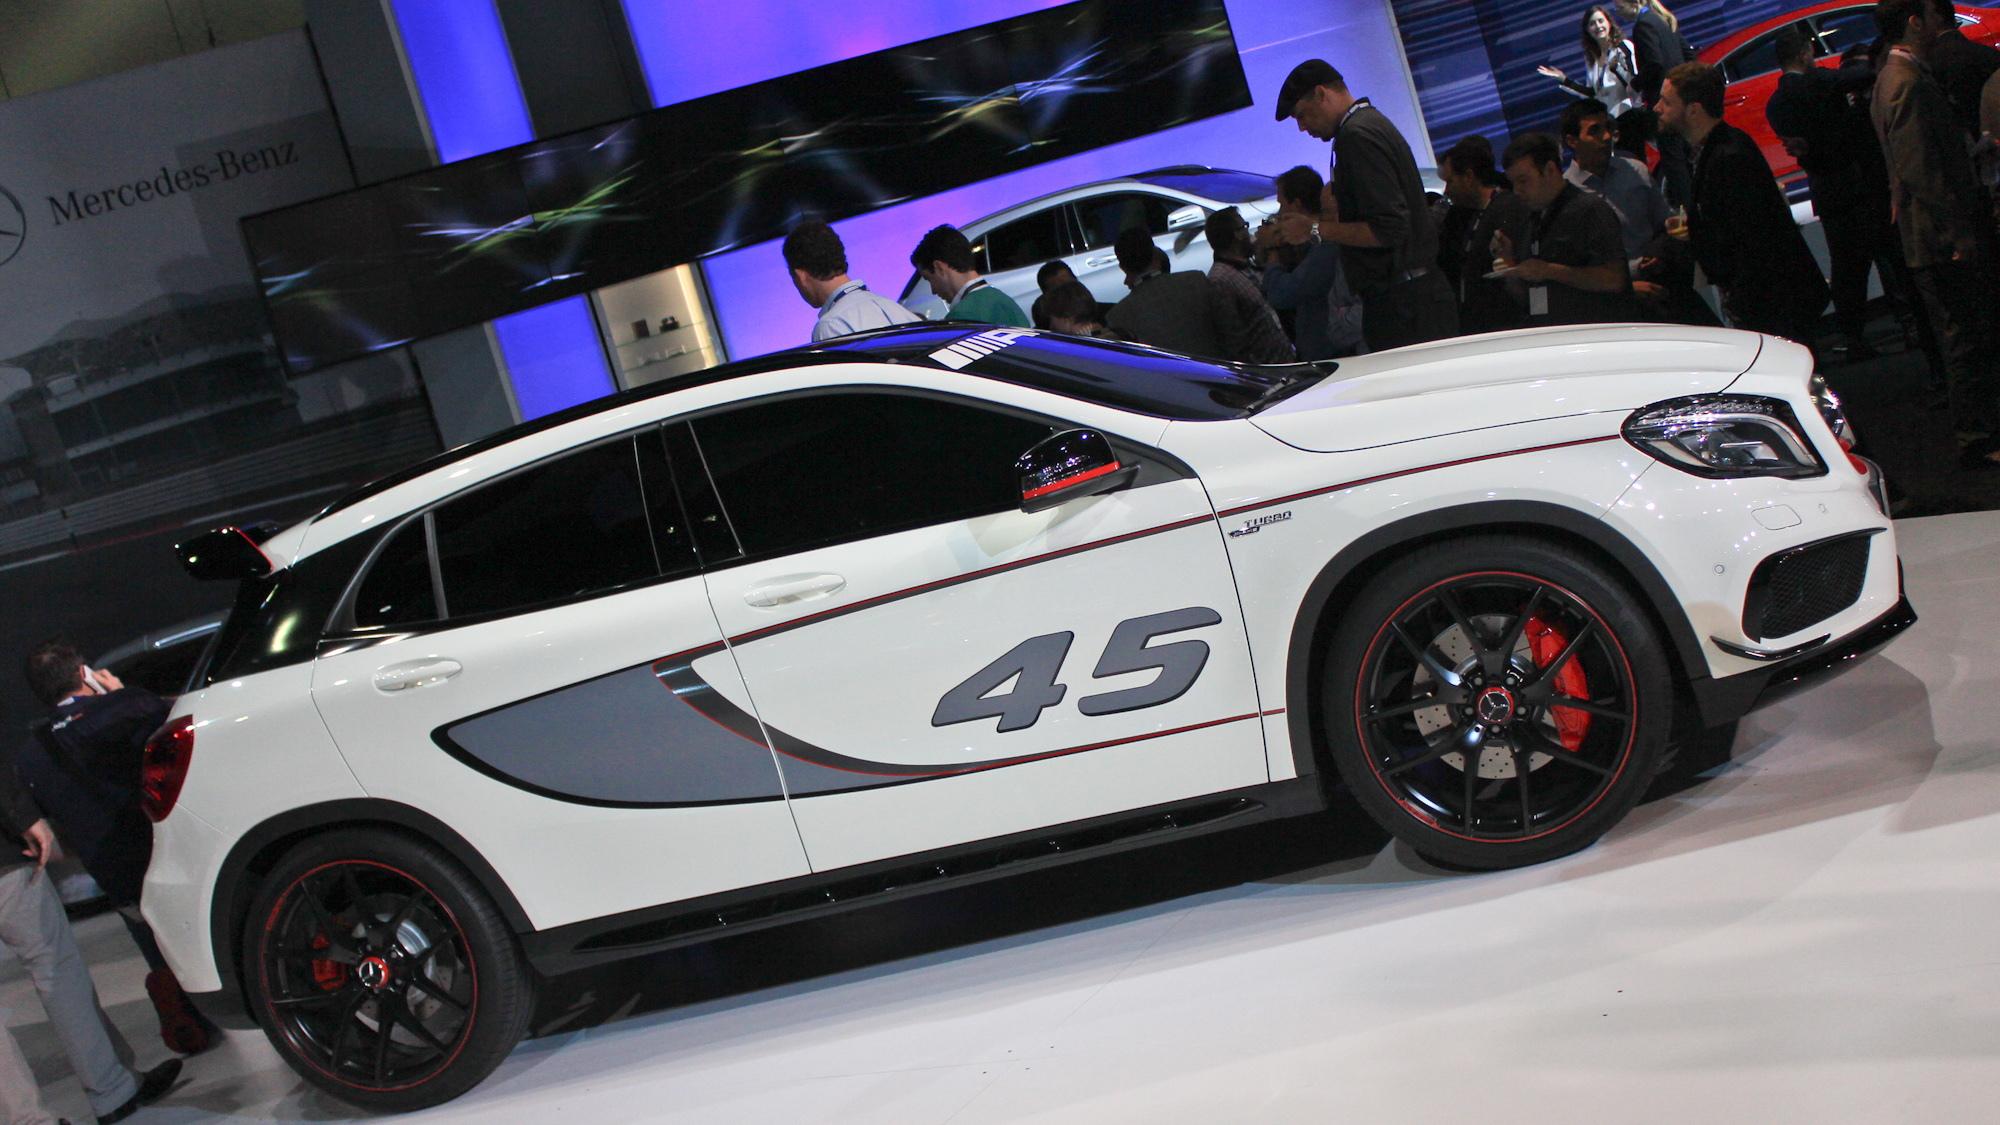 Mercedes-Benz Concept GLA45 AMG, 2013 Los Angeles Auto Show